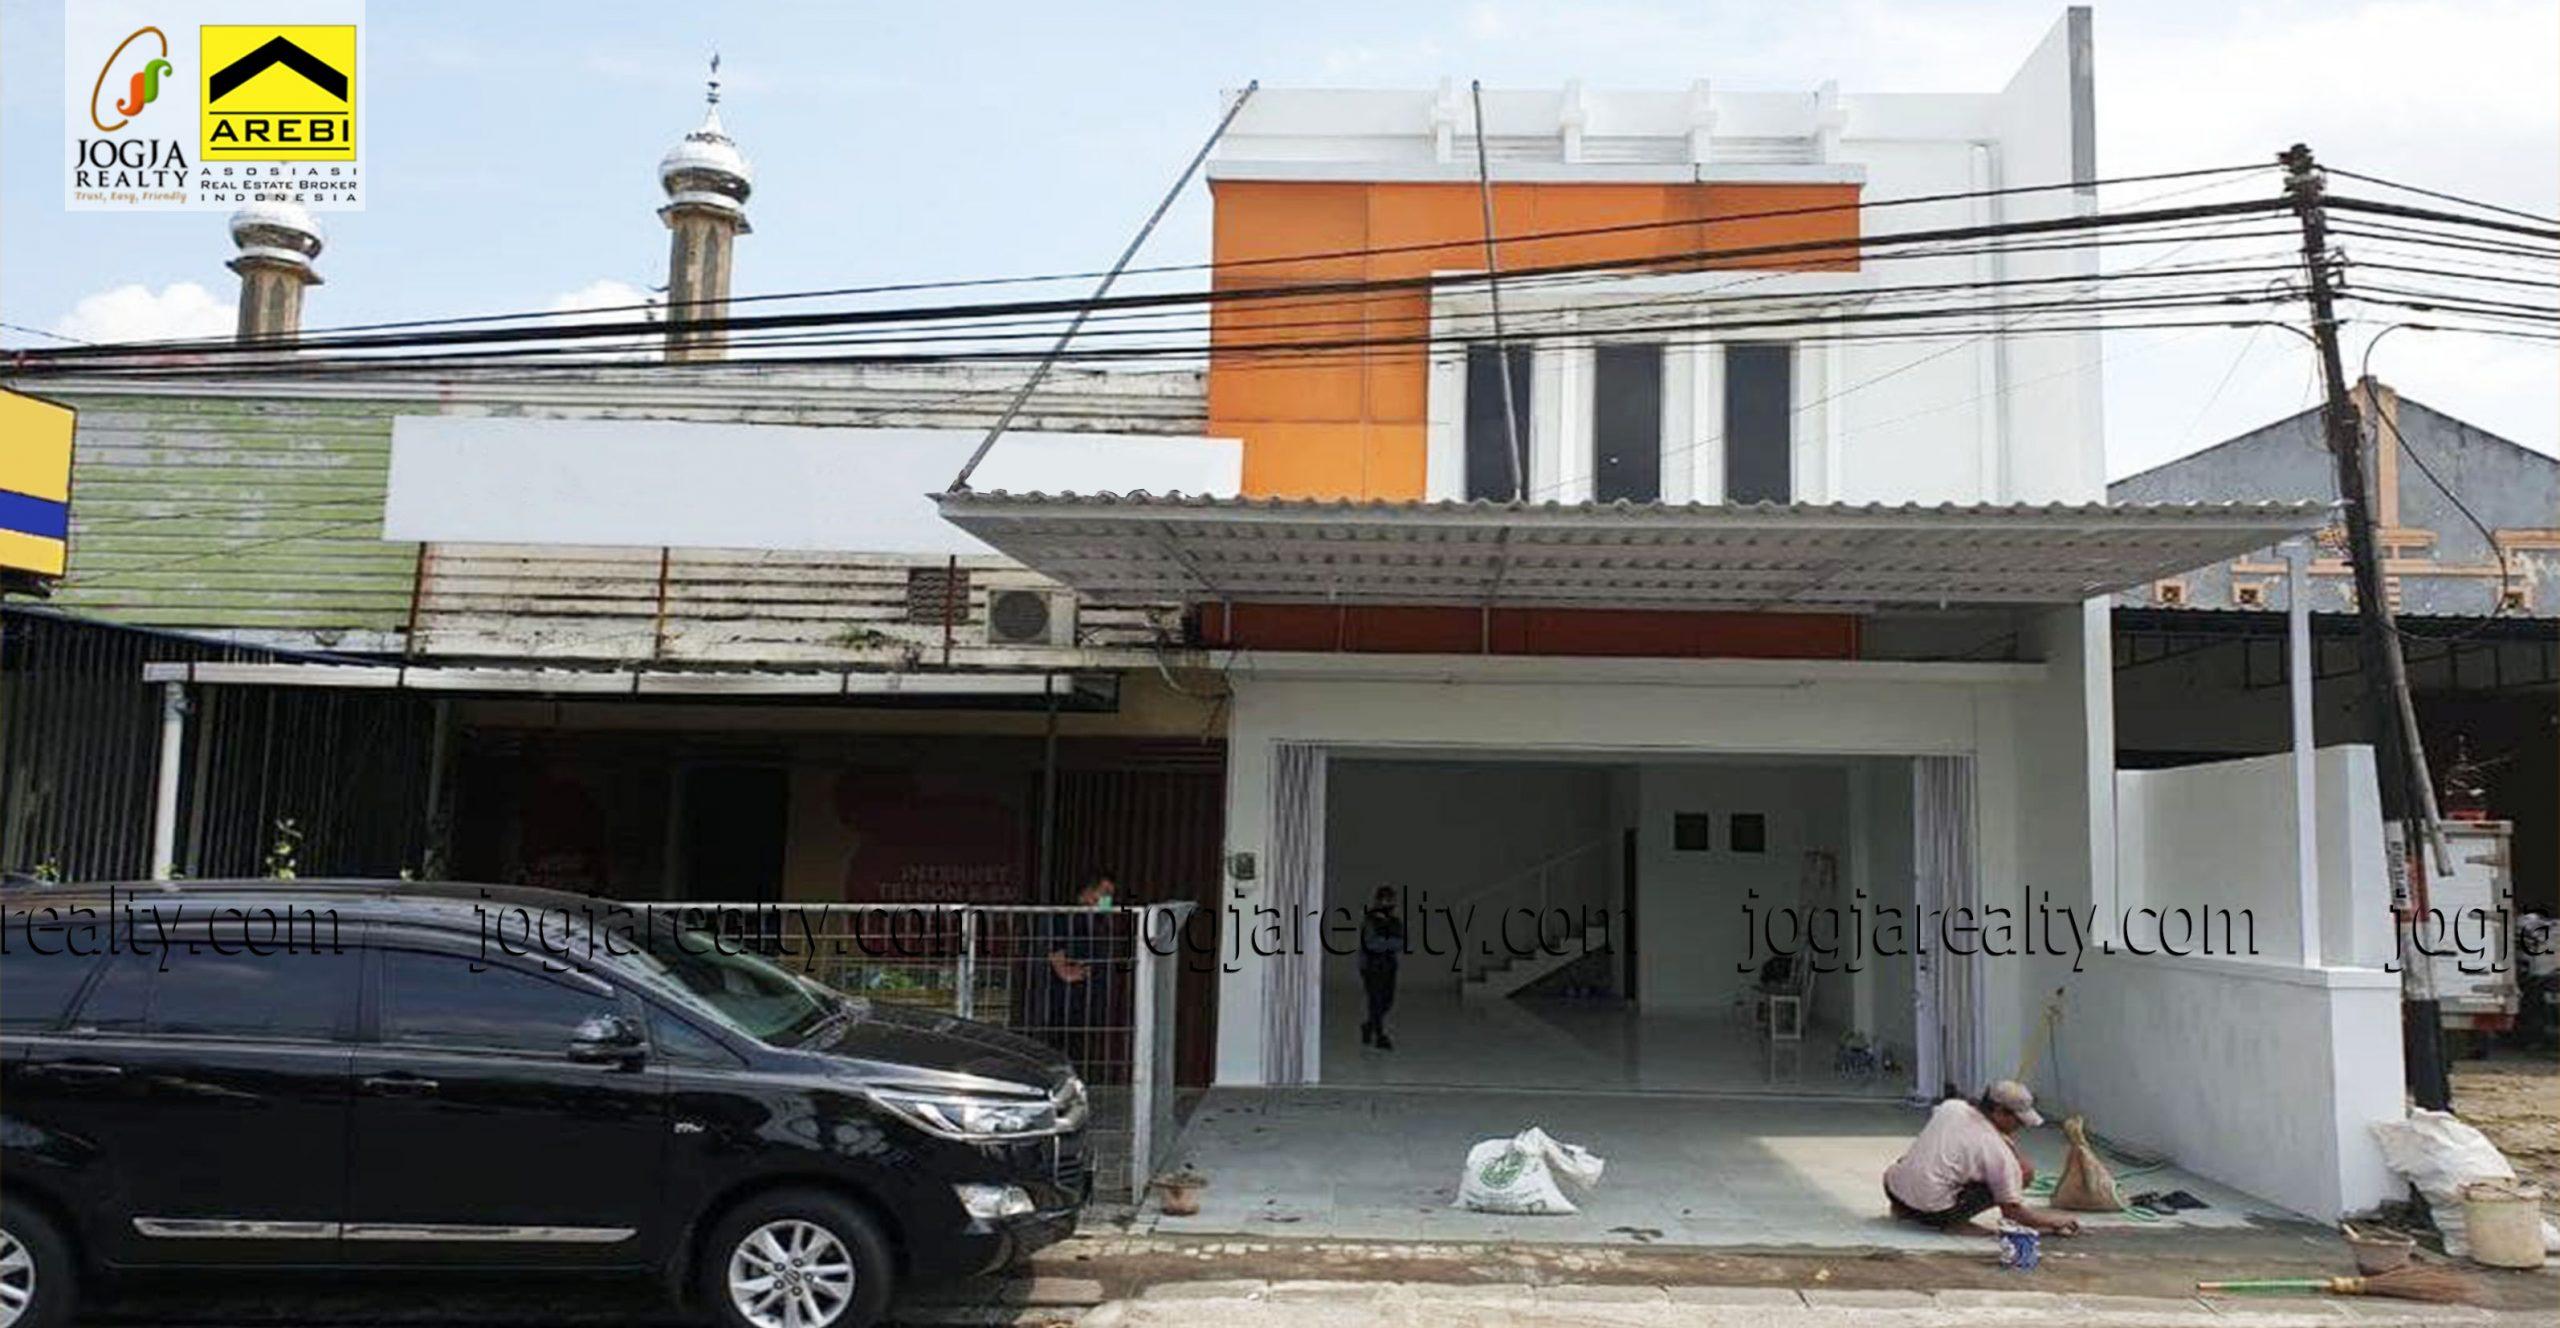 Ruko dijual jalan magelang Sleman Yogyakarta